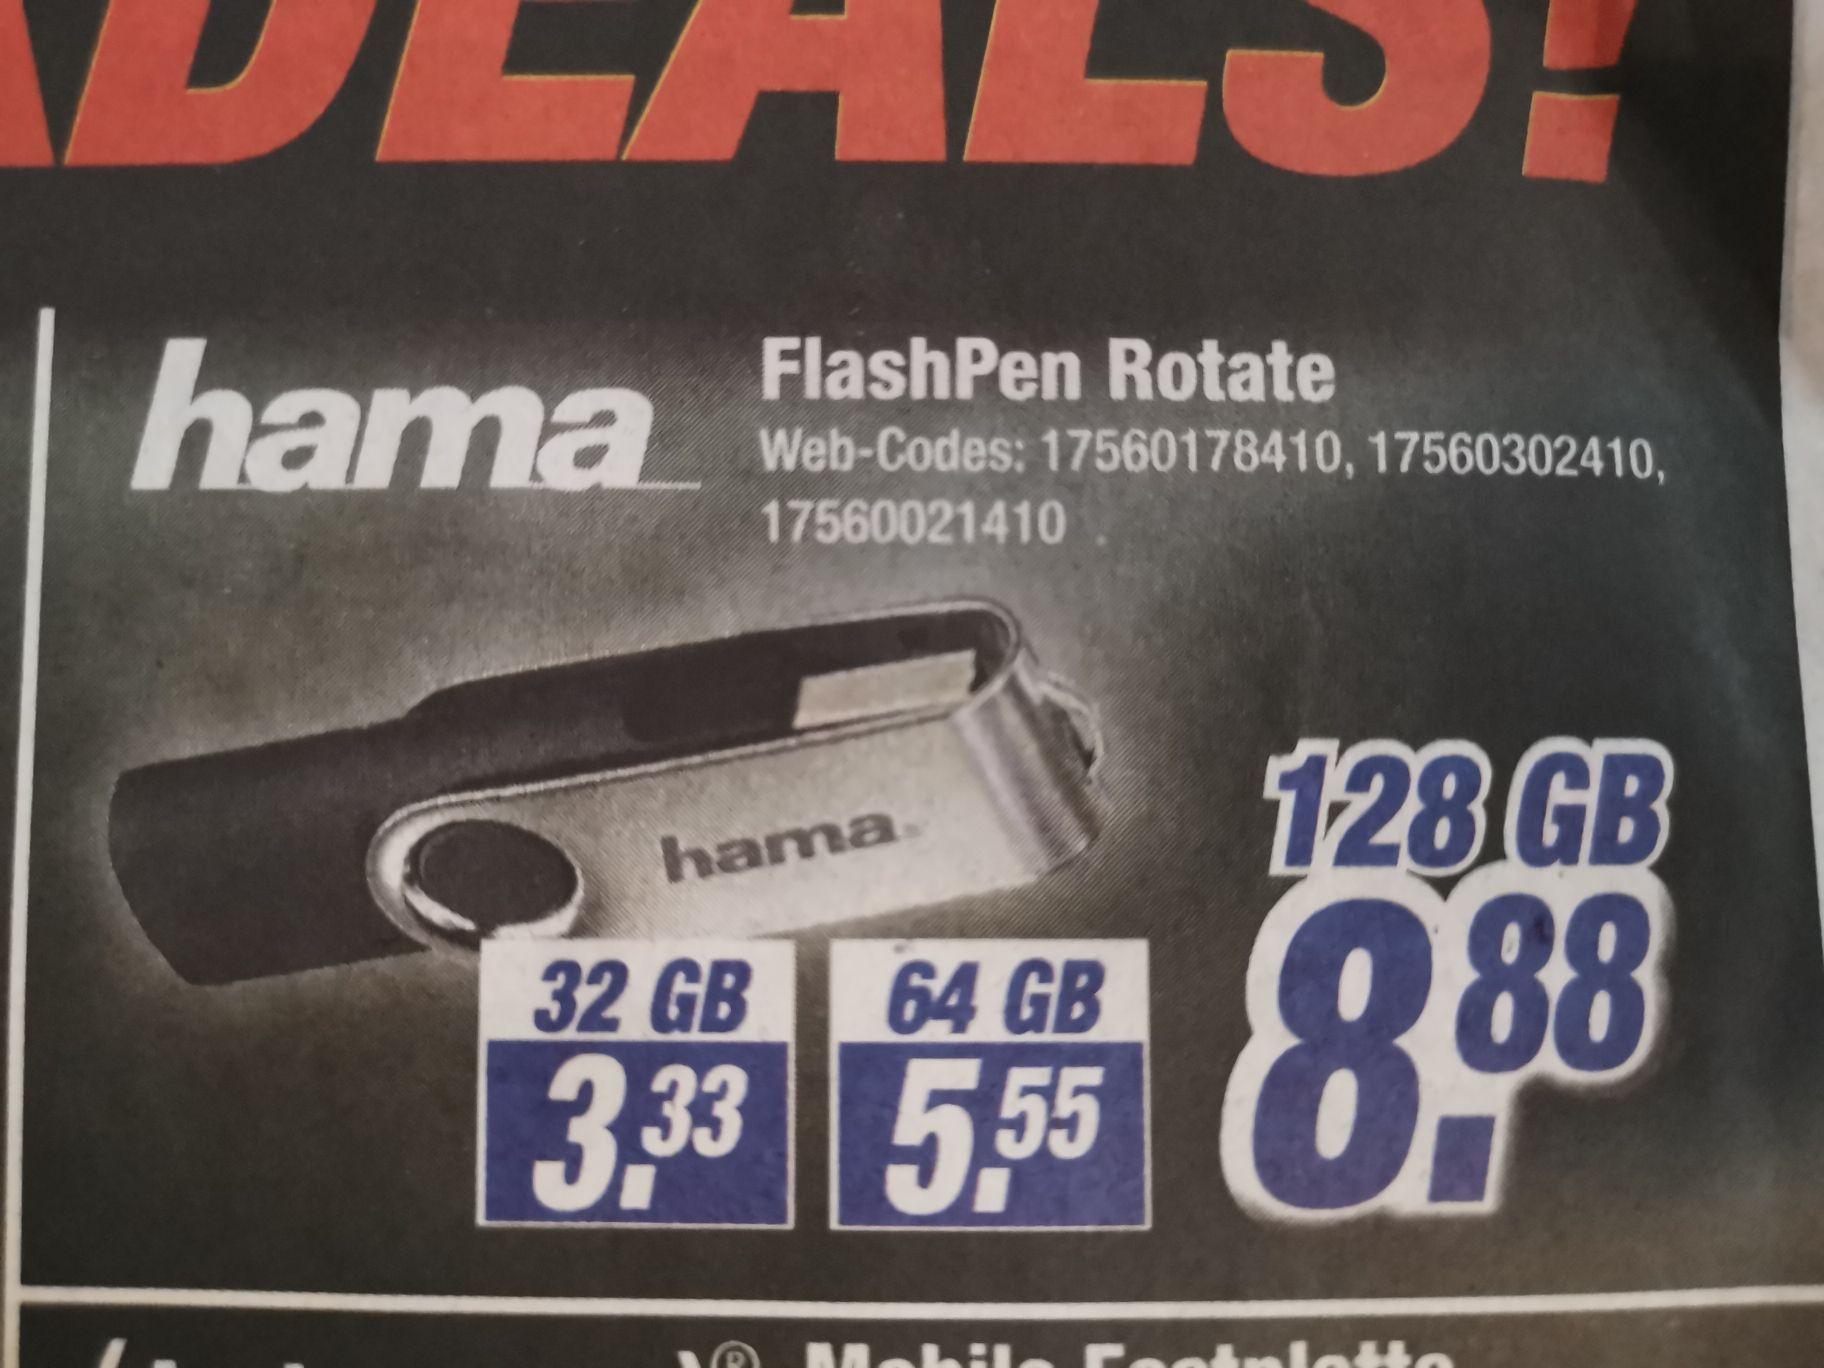 Expert Klein (Lokal) USB 2.0 Hama Flashpen Rotate